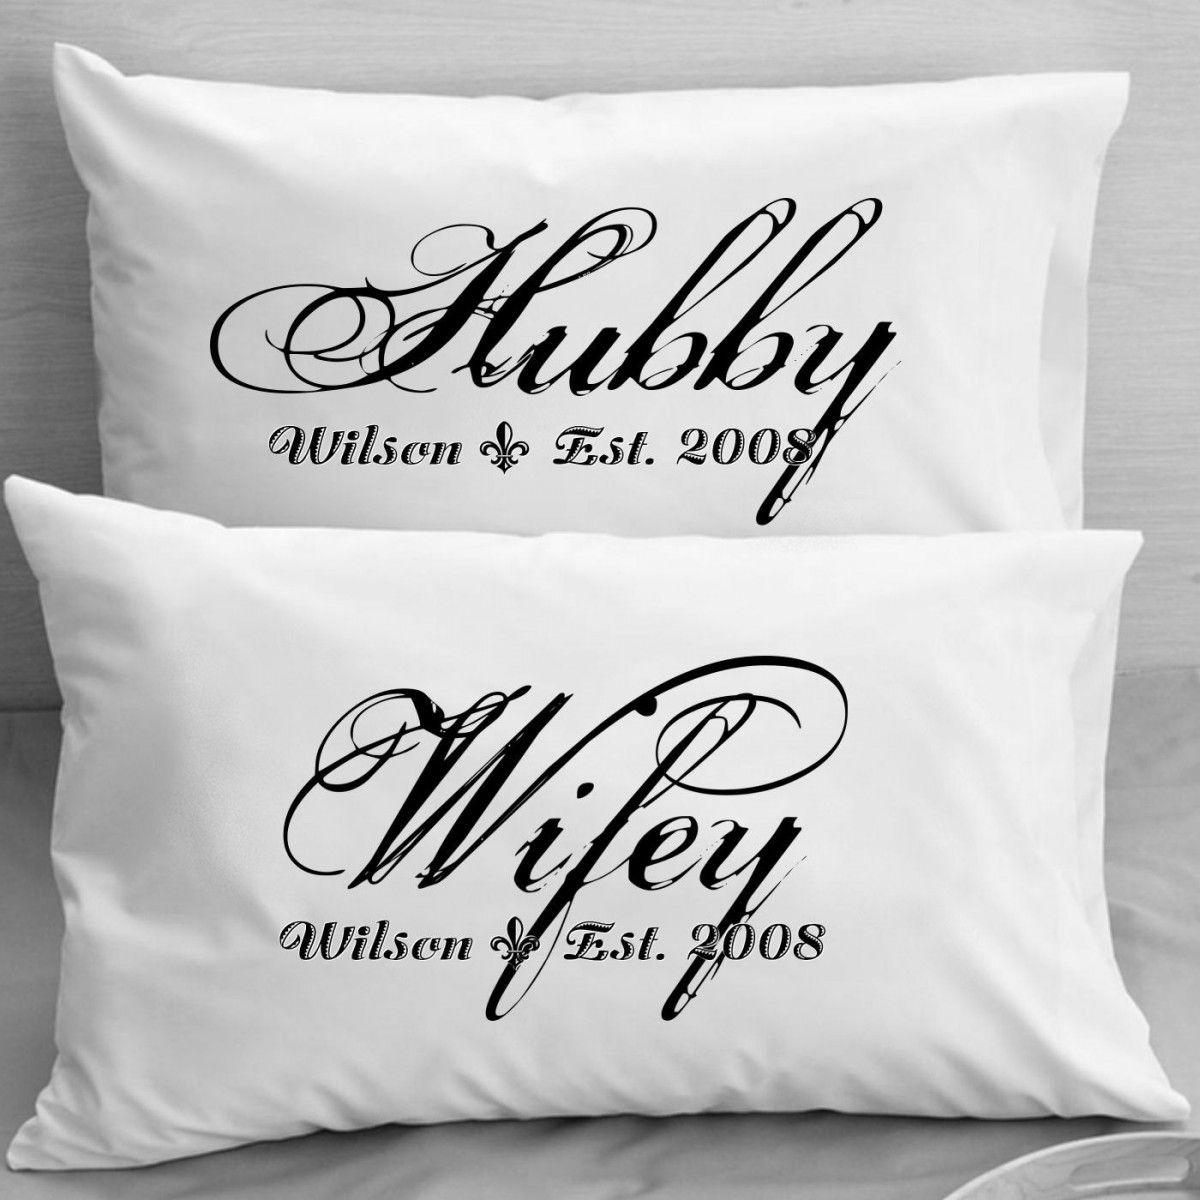 Customized Pillow Cases Couple Pillow Couple Pillowcase